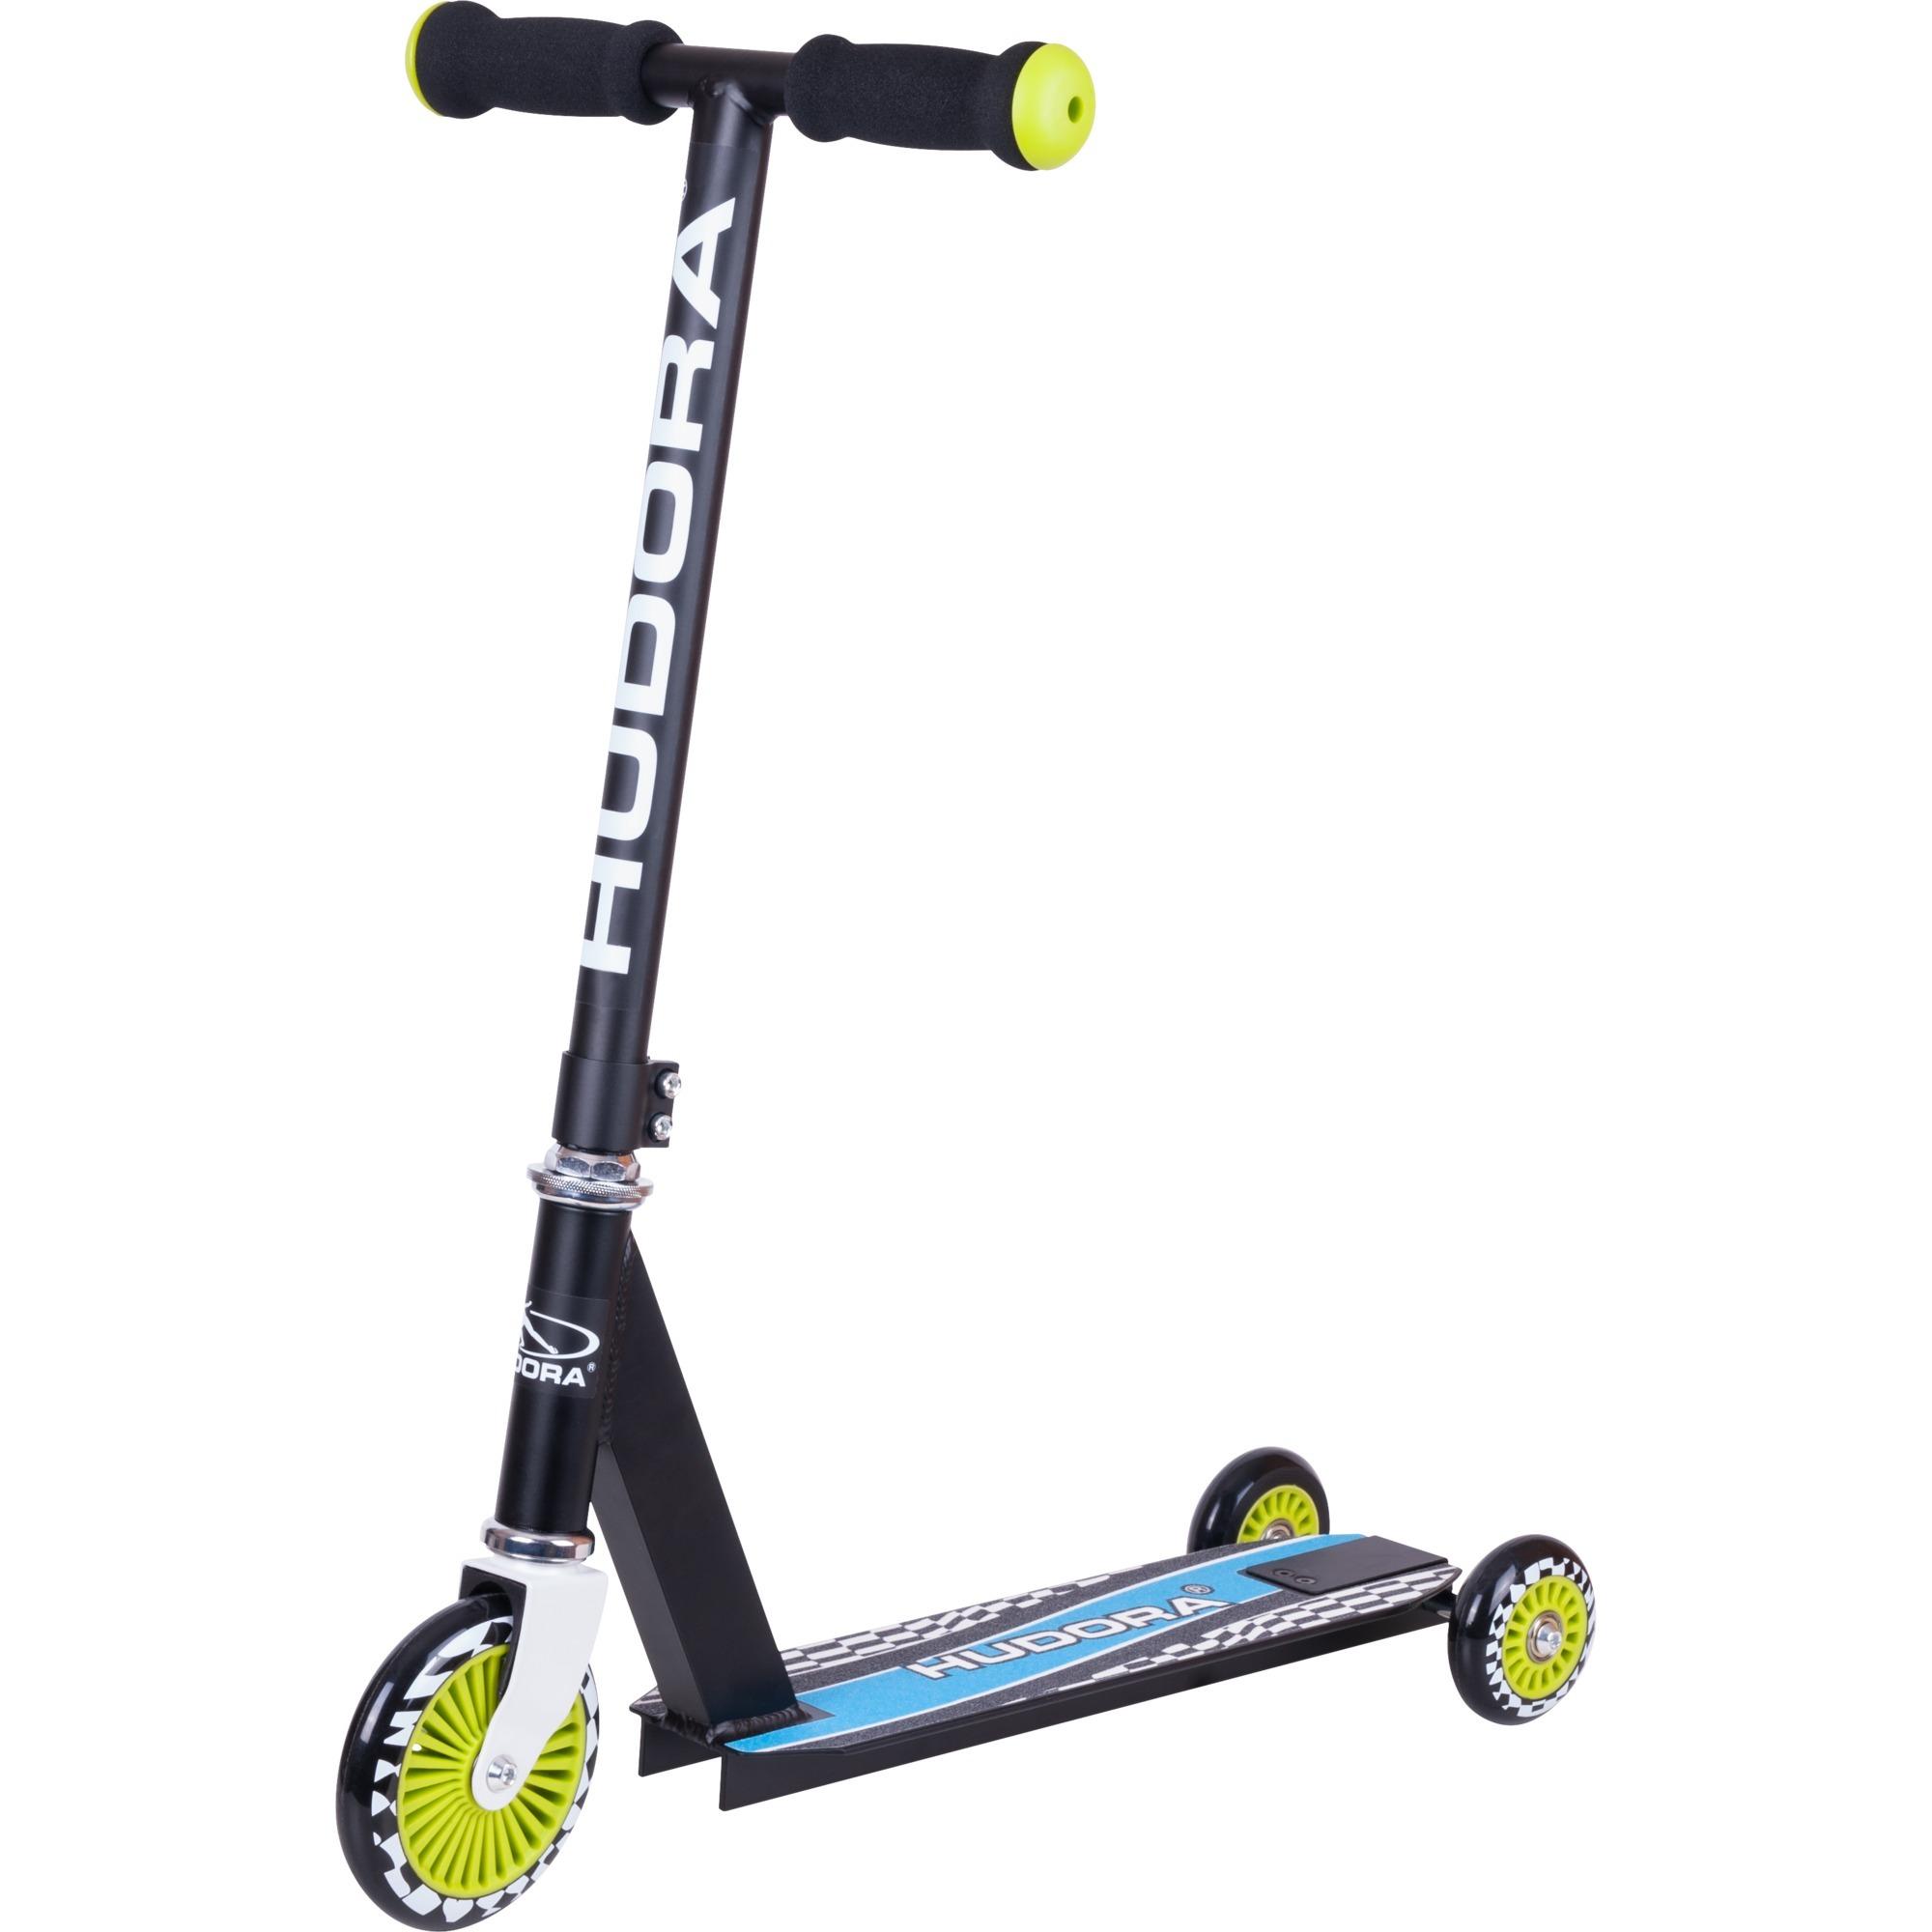 22015 Enfants Noir scooter, Trottinette